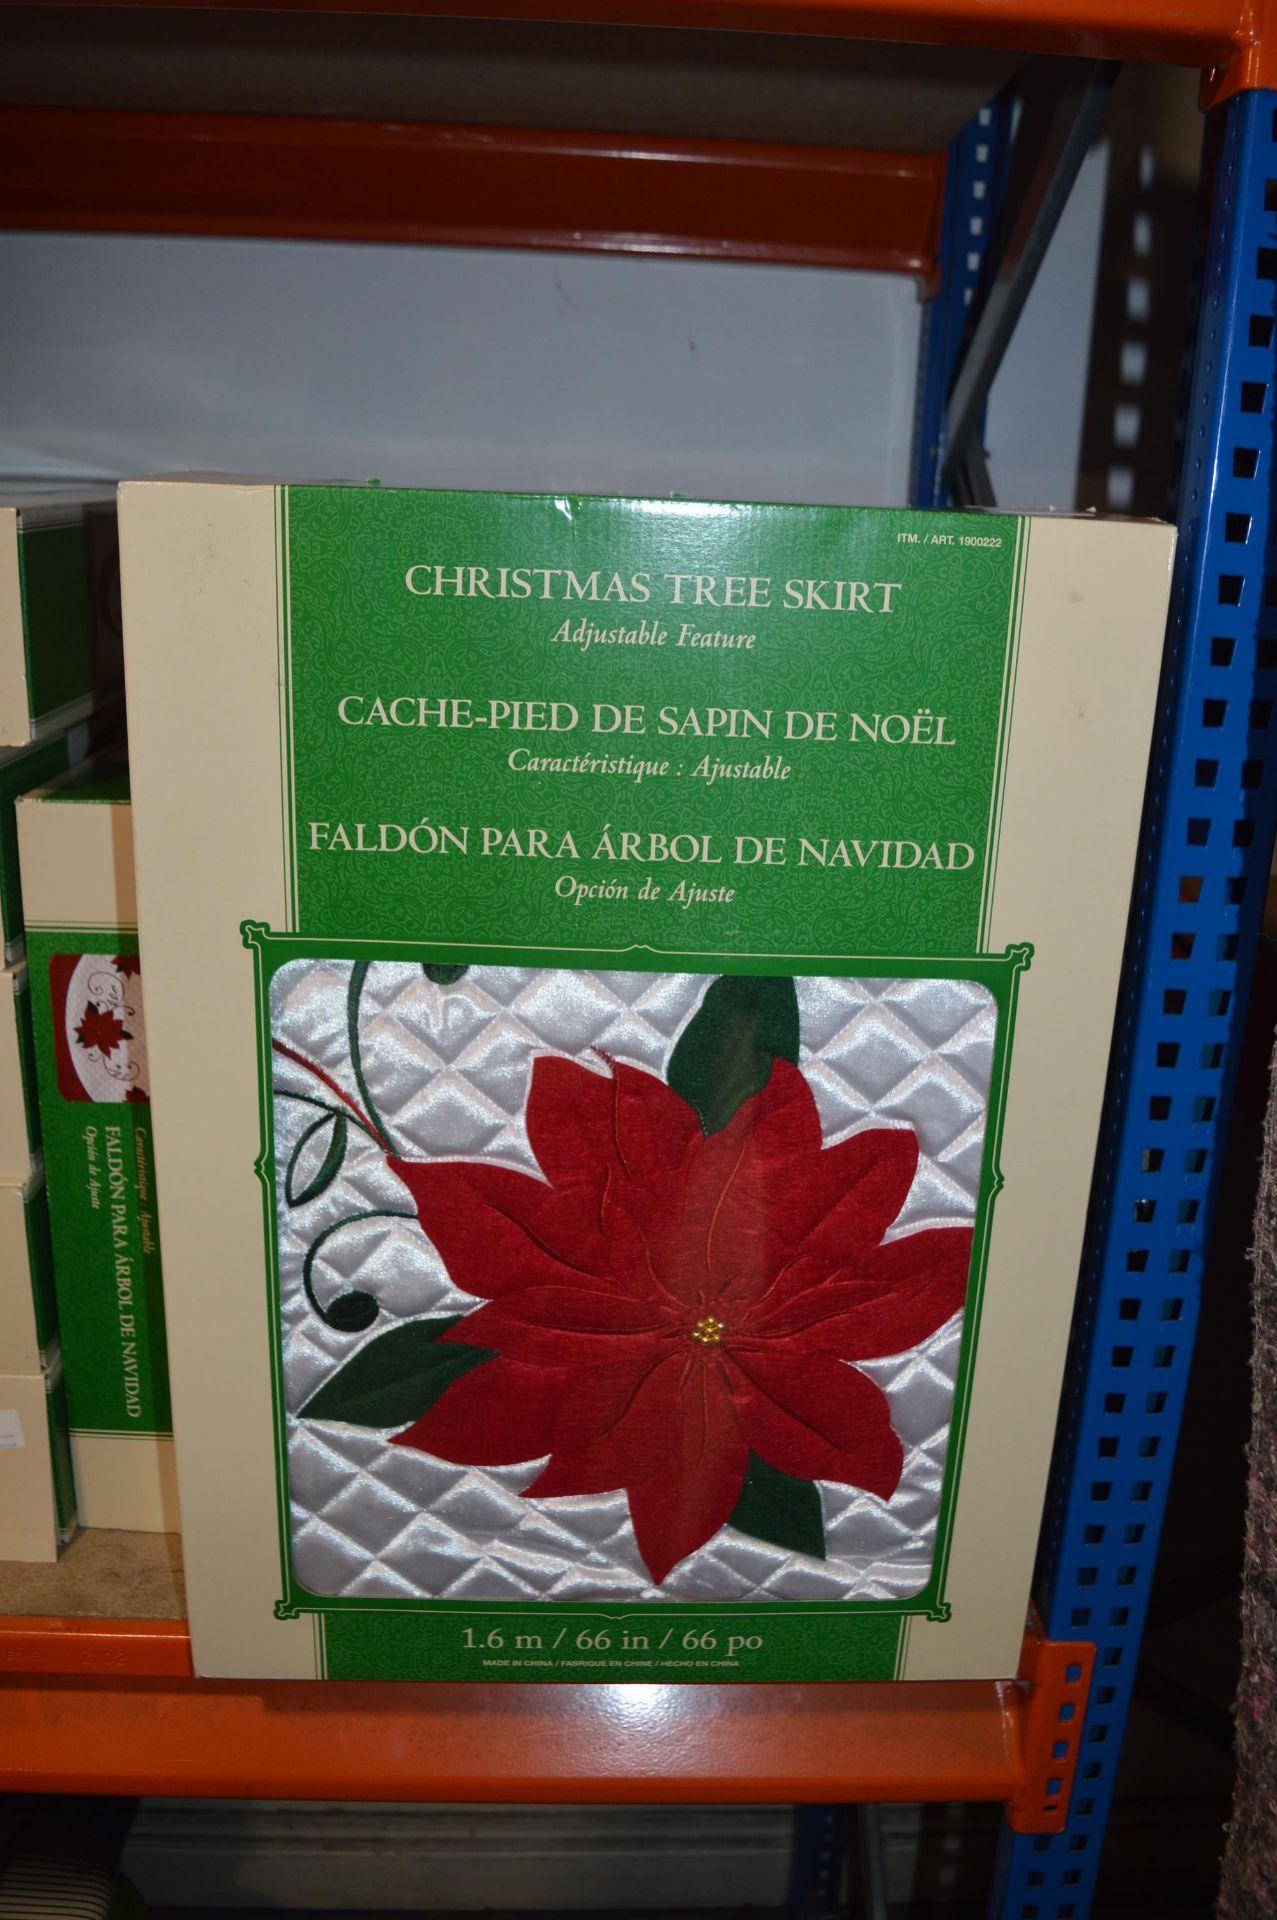 Lot 21 - *Christmas Tree Skirt 1.6m